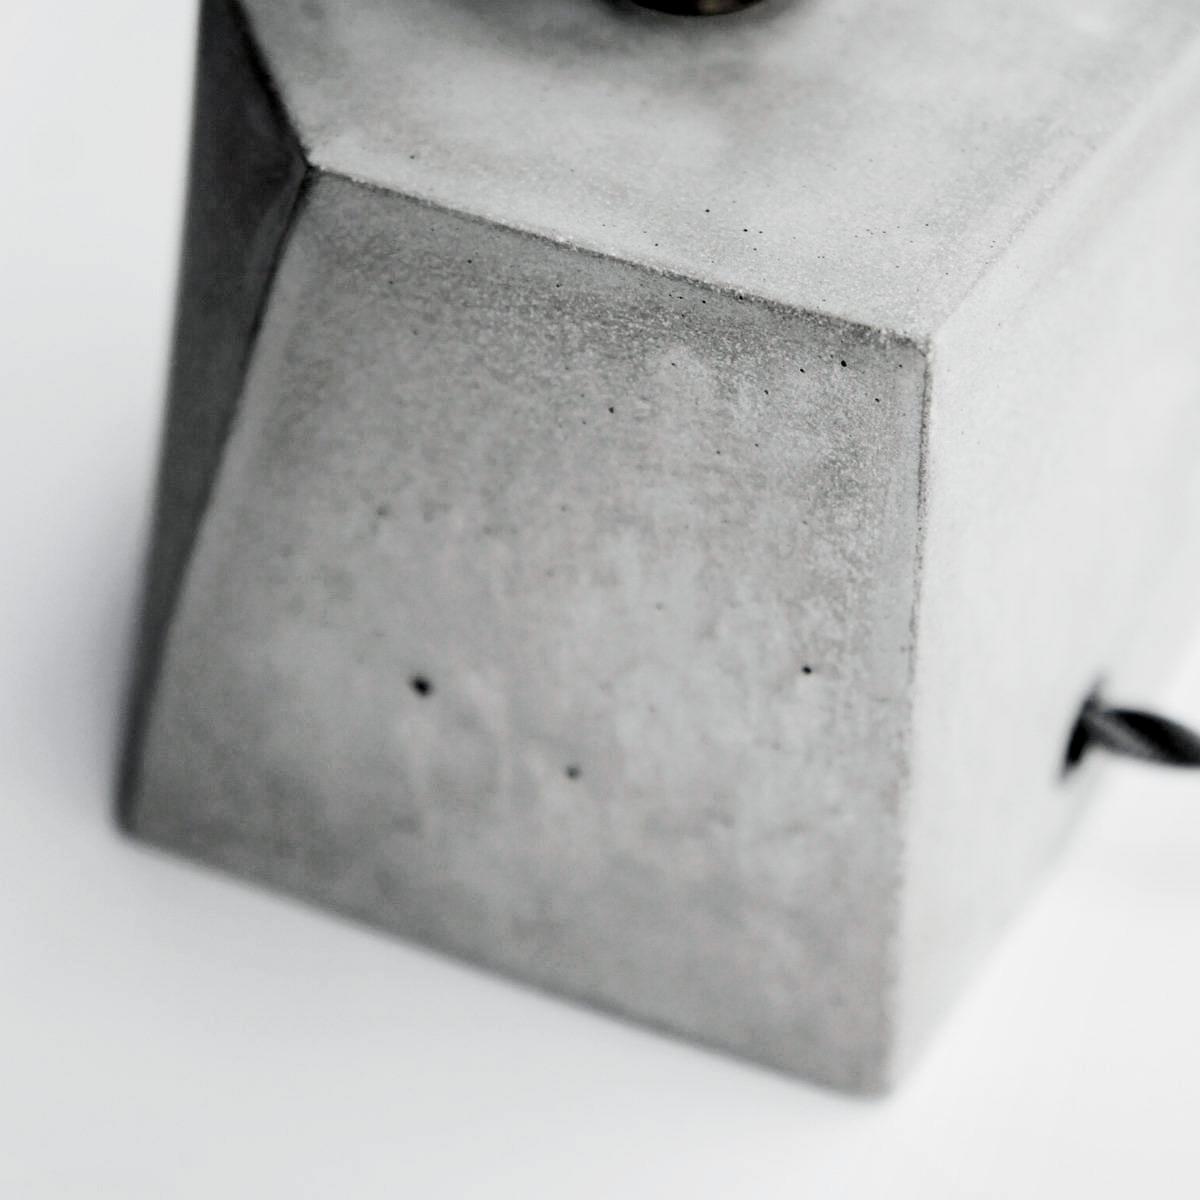 Concrete Design 青古銅幾何切角設計水泥燈・桌燈・禮物